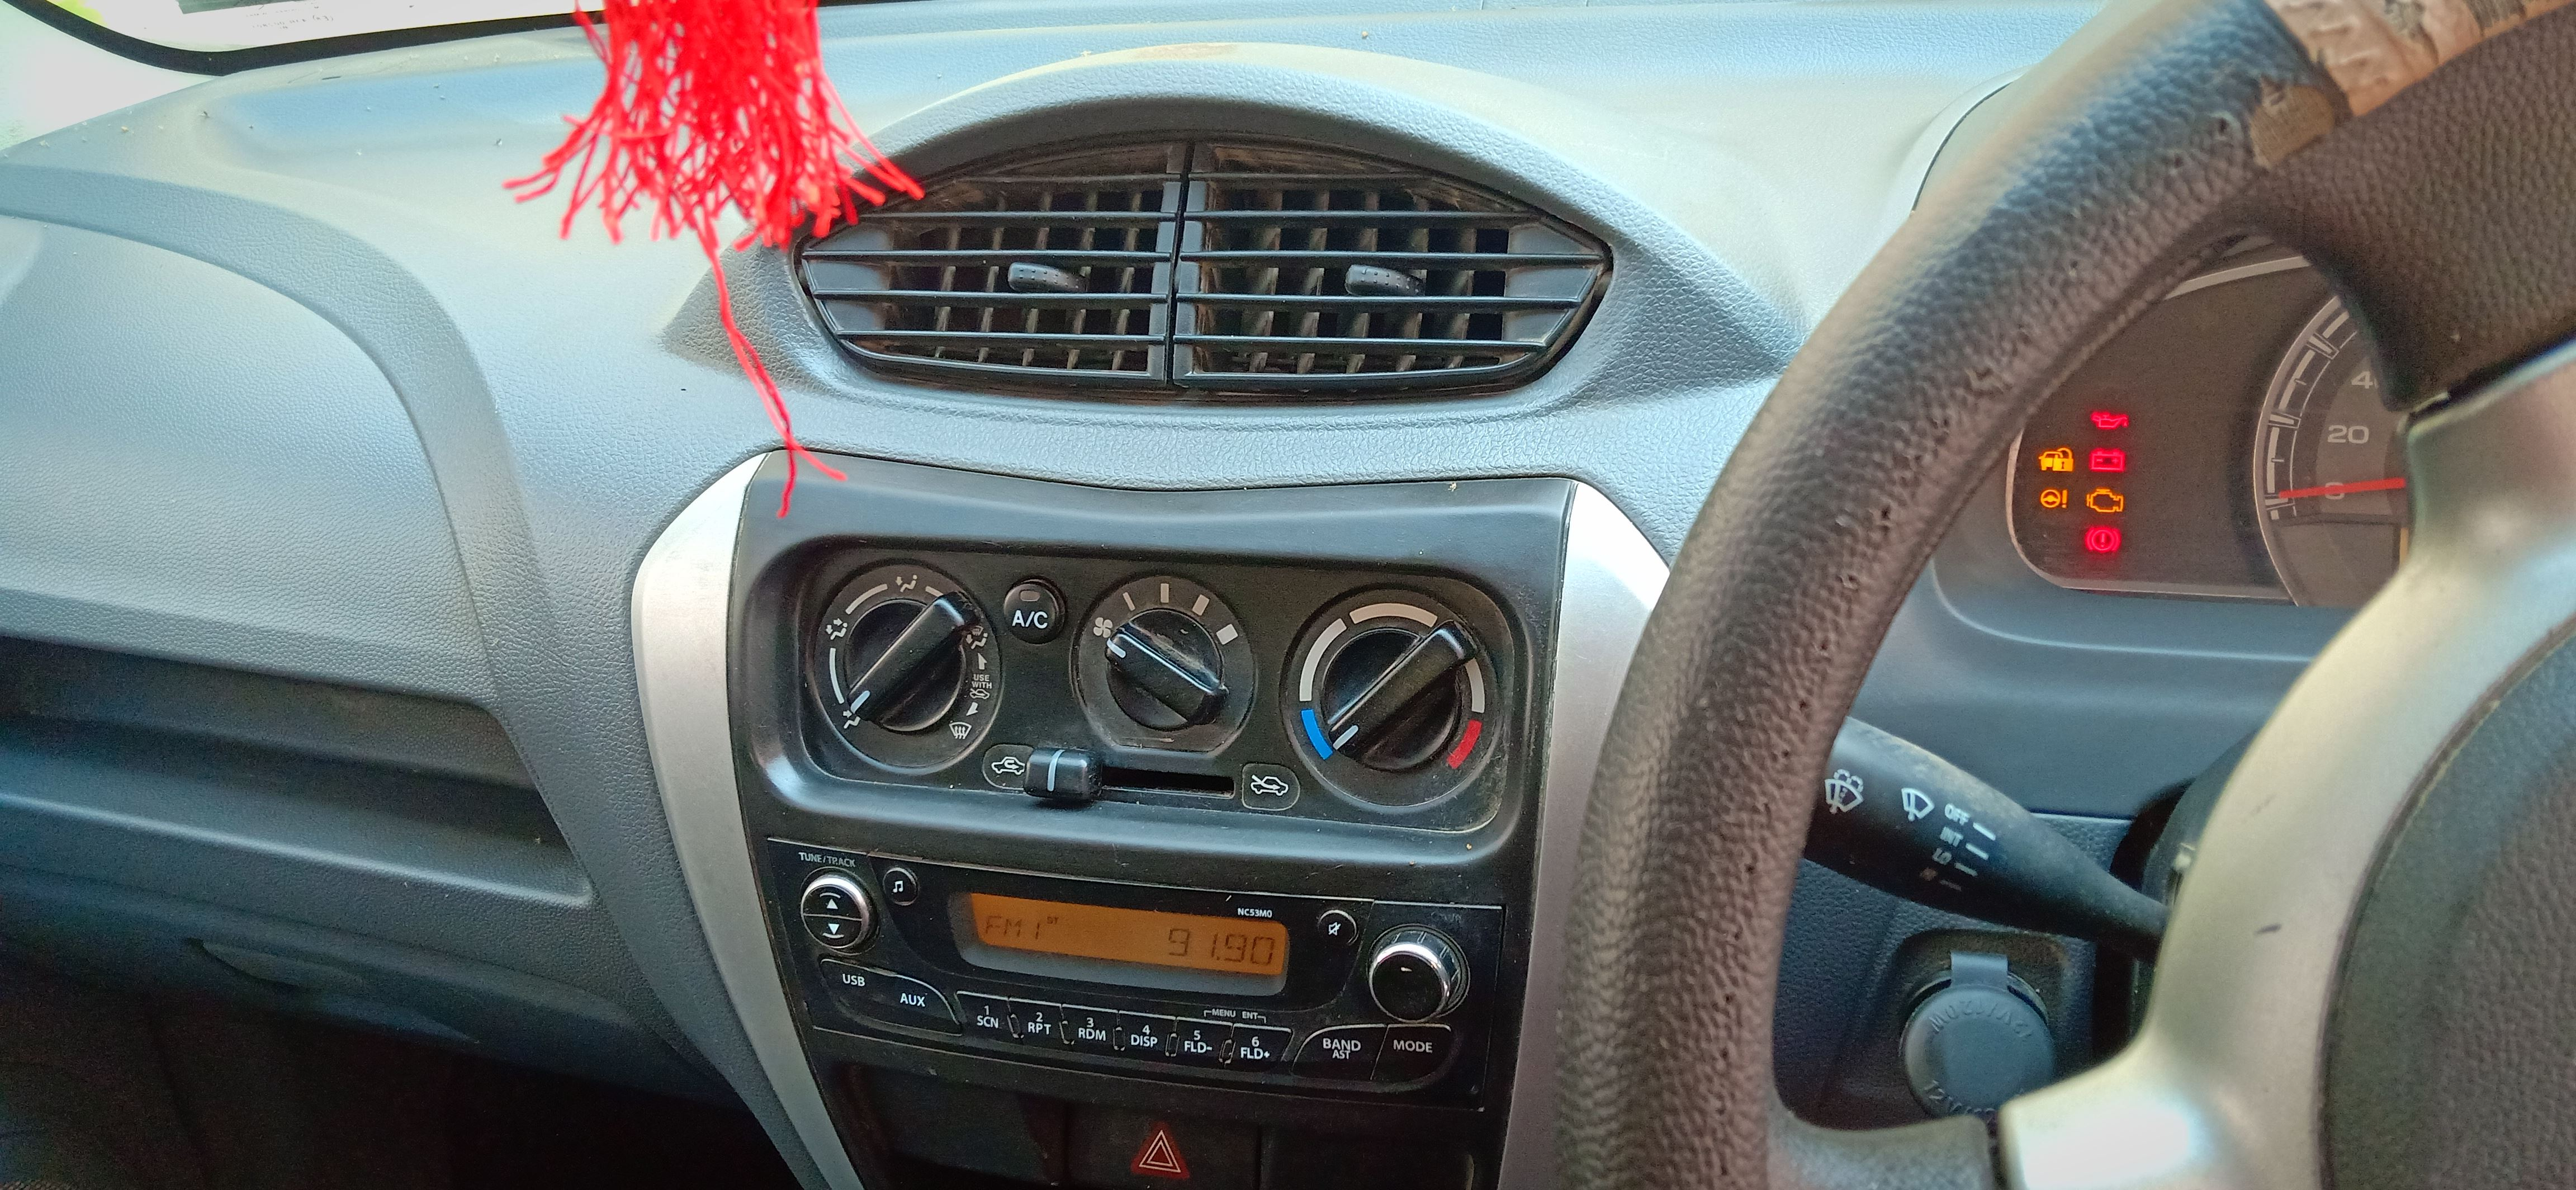 2015 Used Maruti Suzuki Alto 800 ALTO 800 VXI